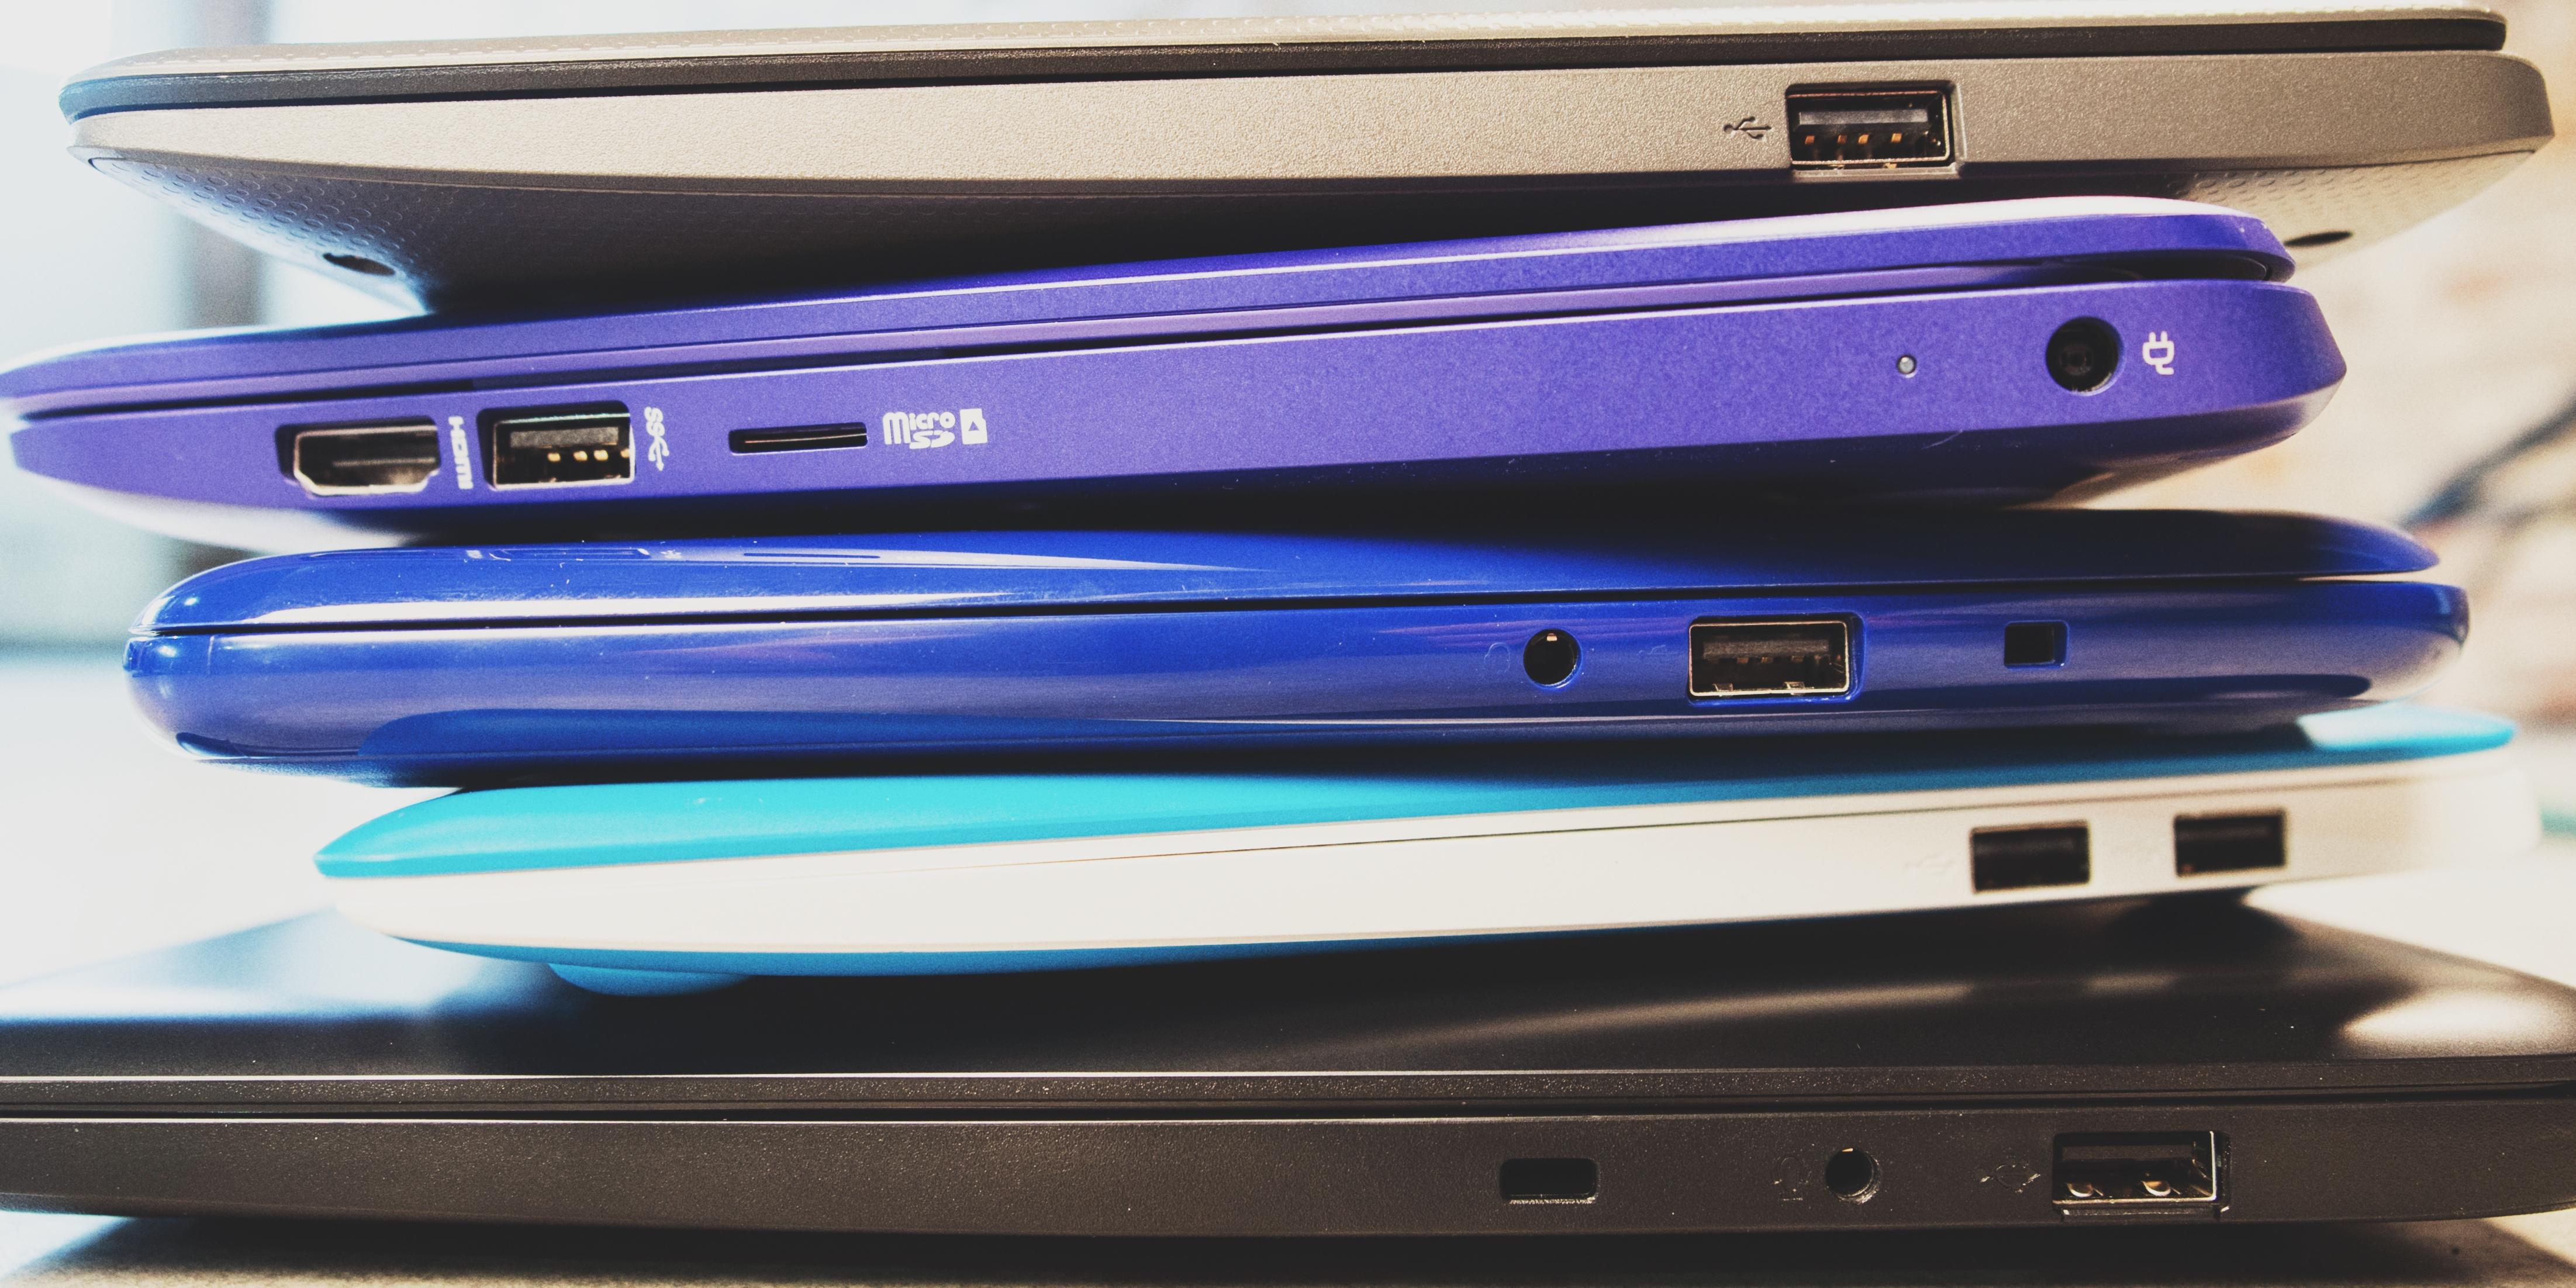 The Best Cheap Laptops Under 200 2016 Reviewed Com